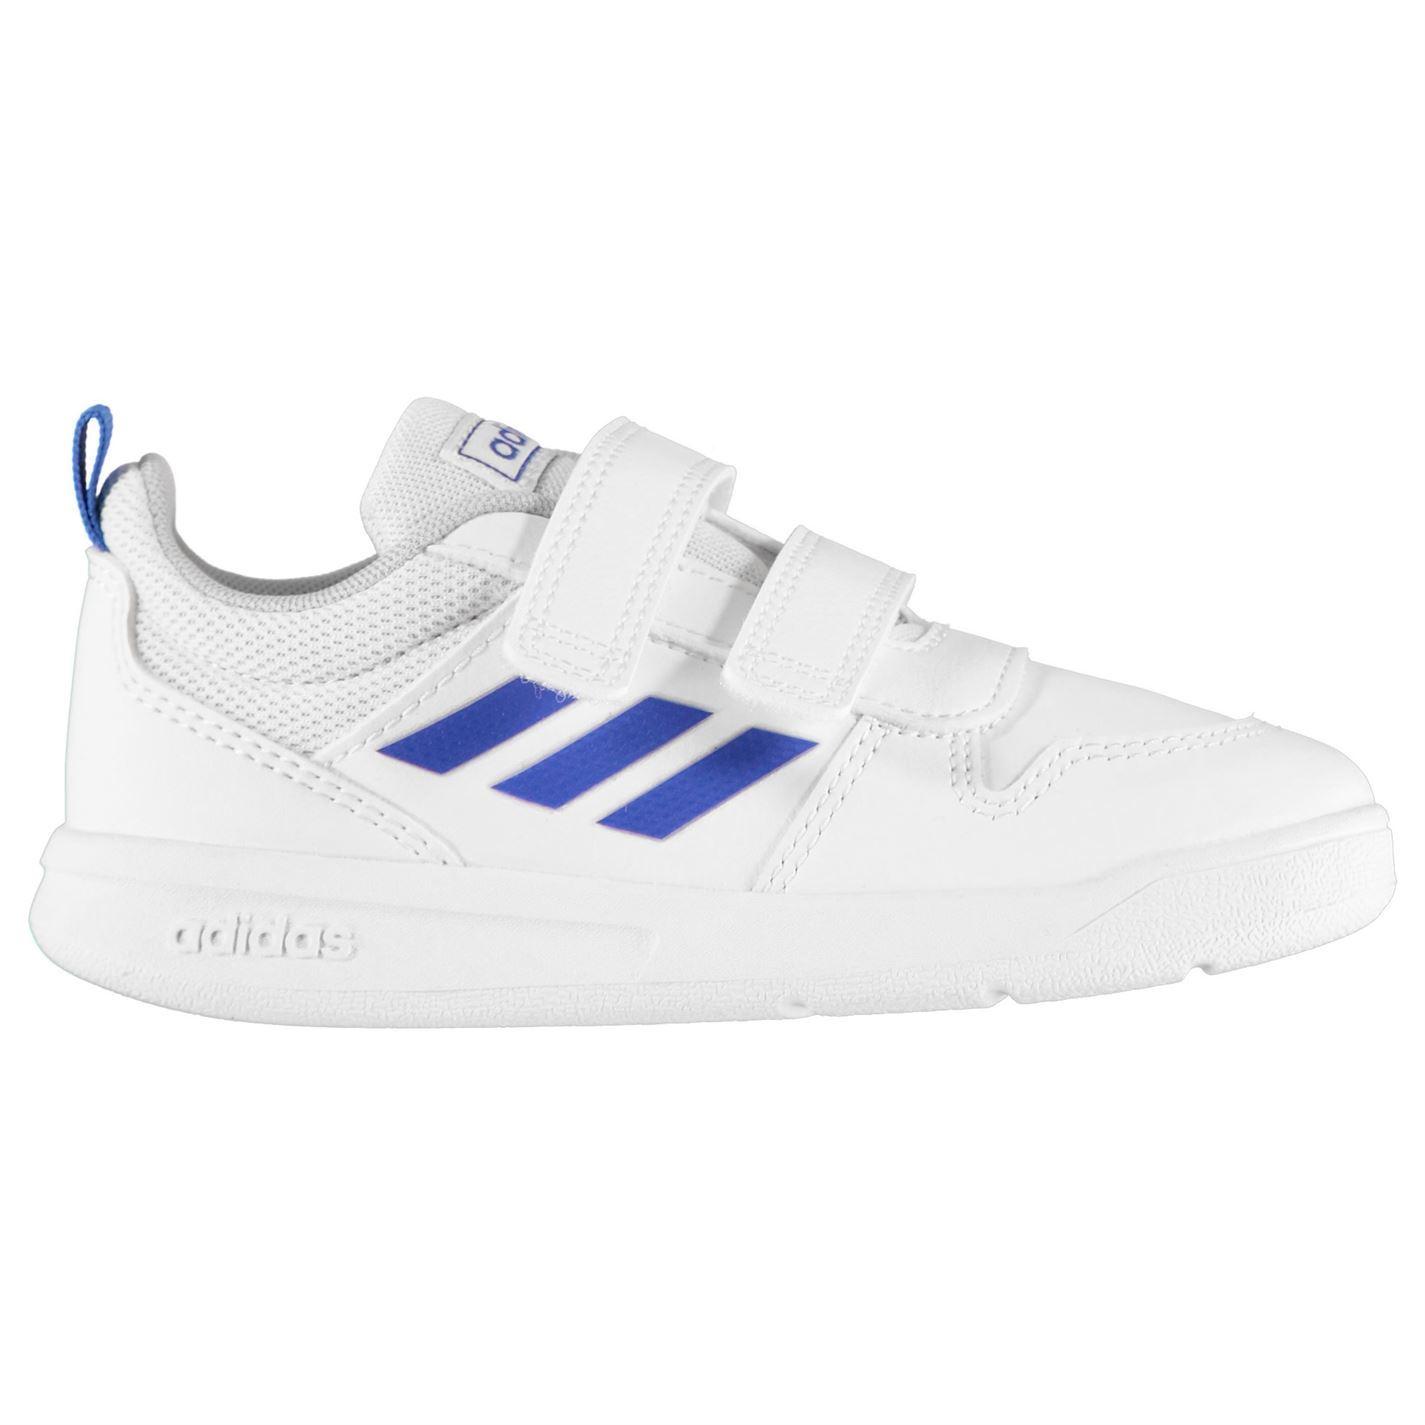 Detalles de Adidas Vector Cloudfoam Zapatillas Bebé Niño Zapatos Correr Athleisure Calzado